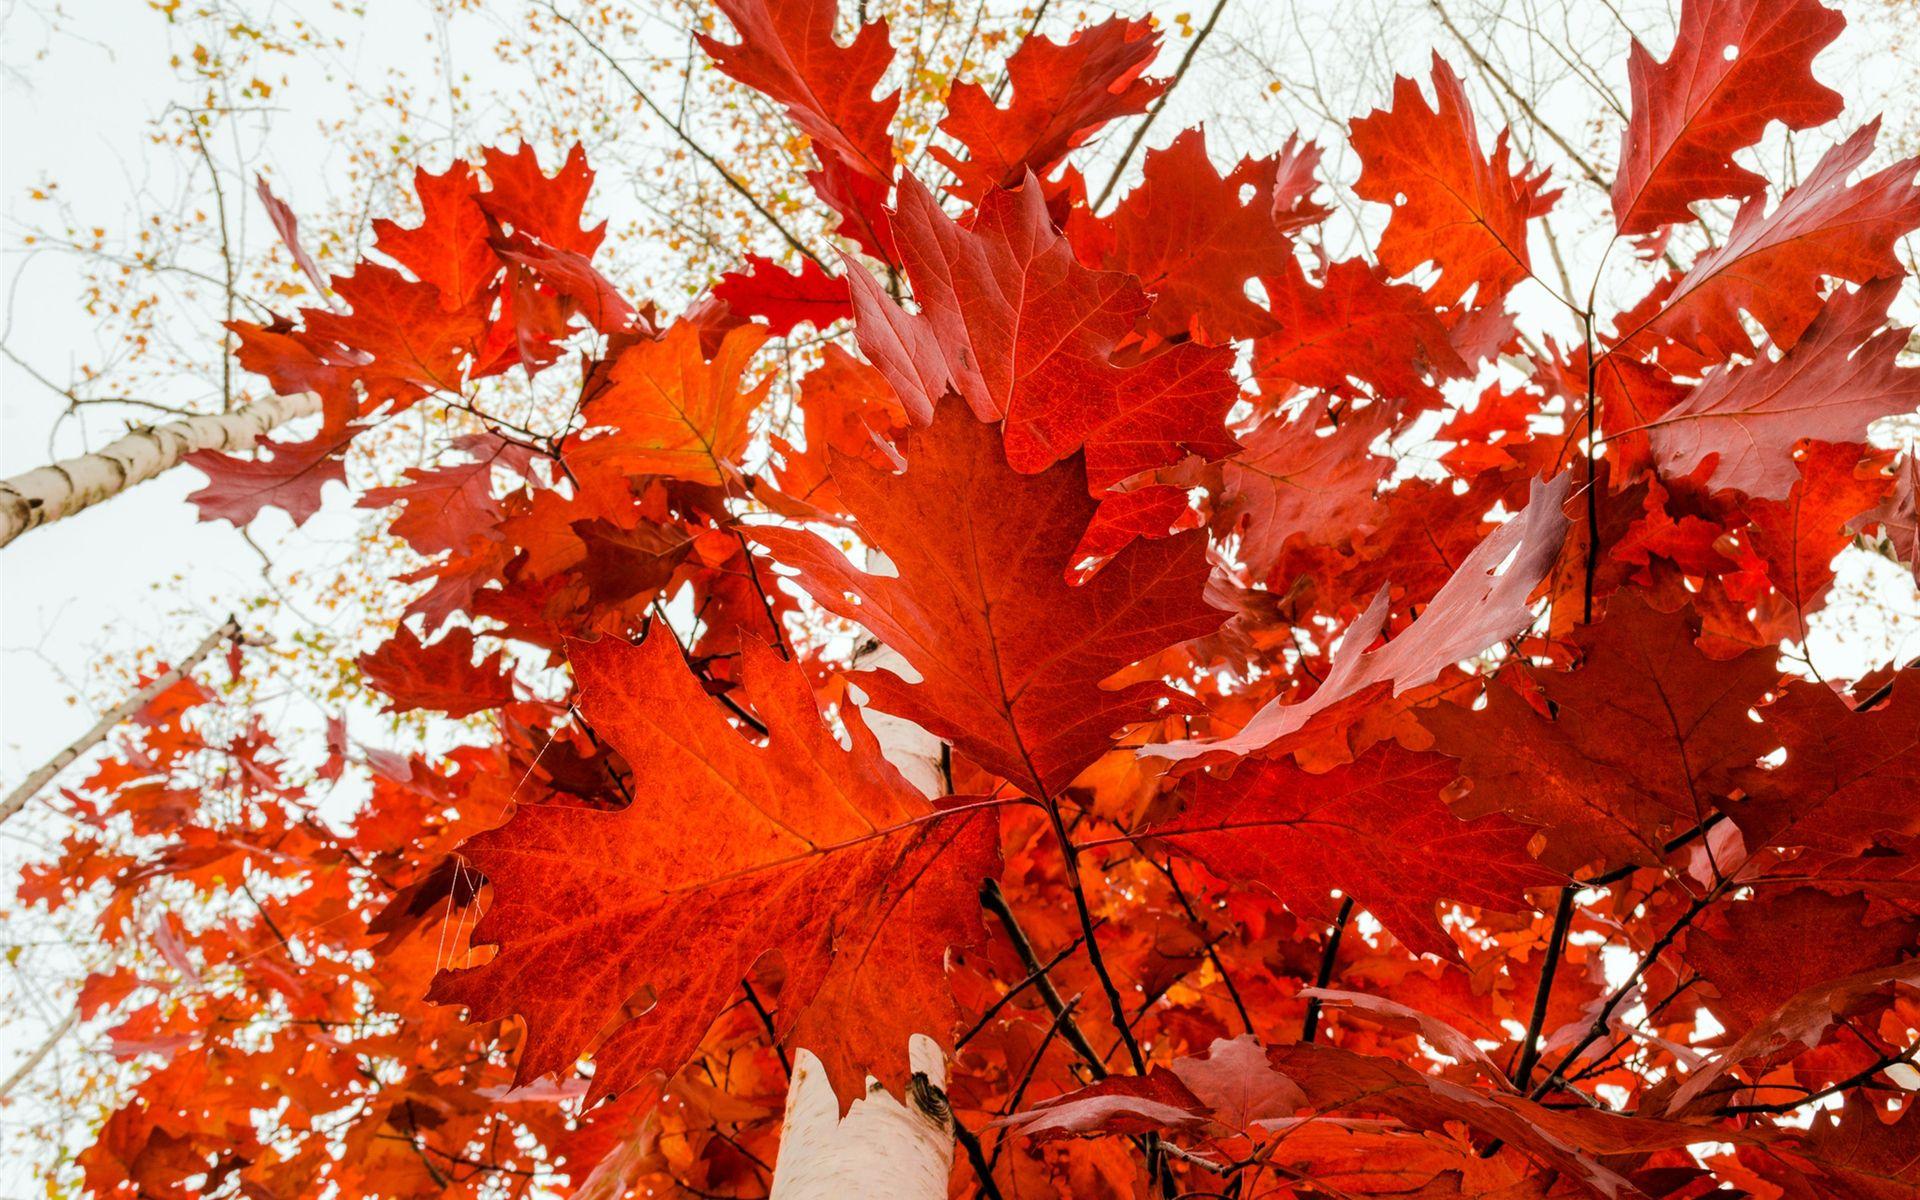 beautiful nature autumn leaves - Google Search